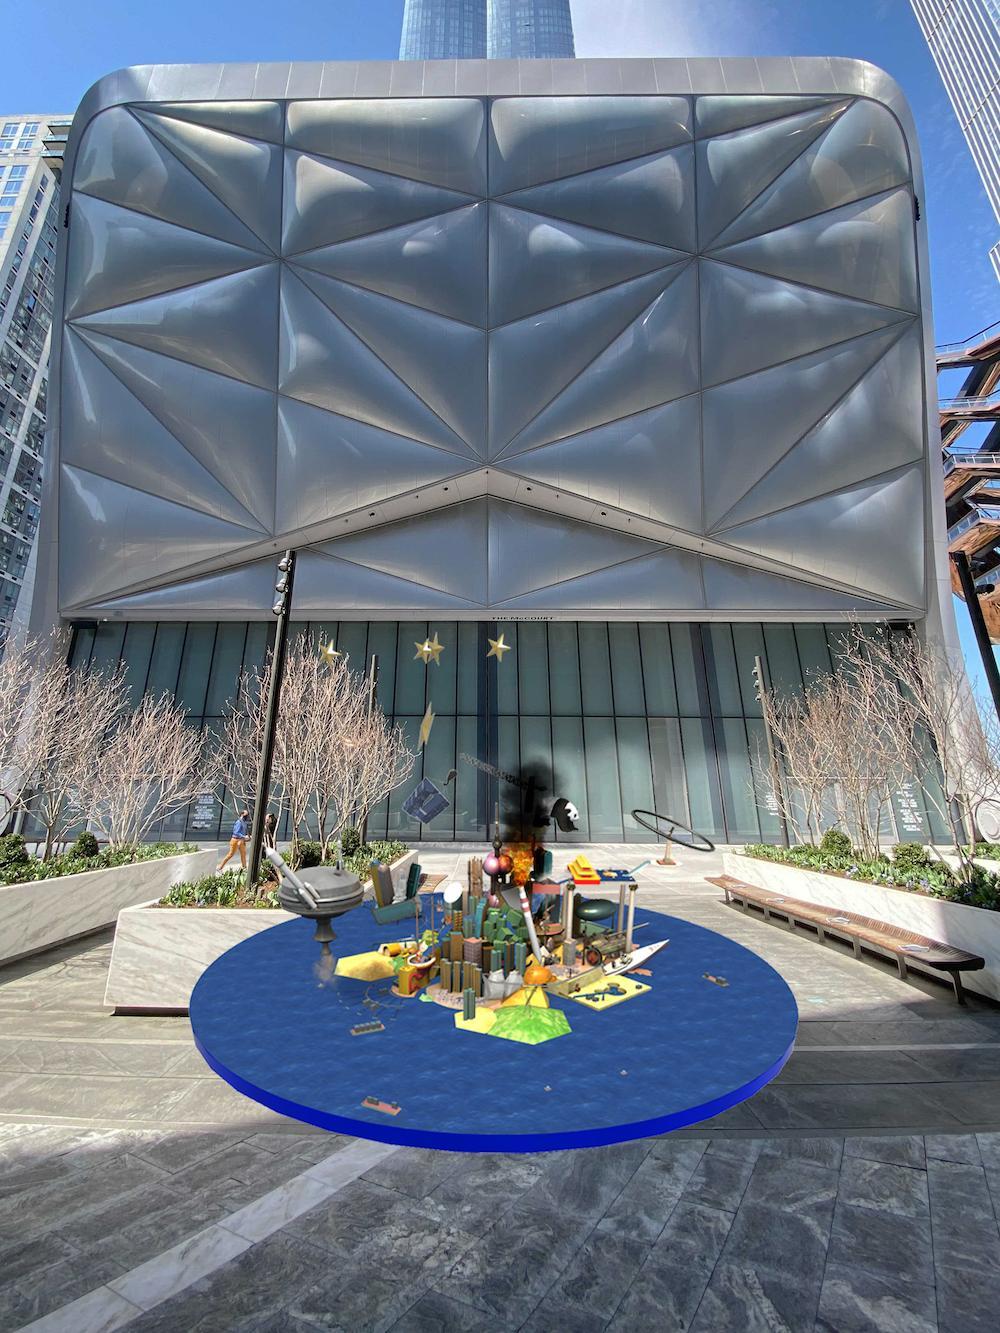 Cao Fei, RMB City AR, augmented reality, 2020. Courtesy Cao Fei and Acute Art.